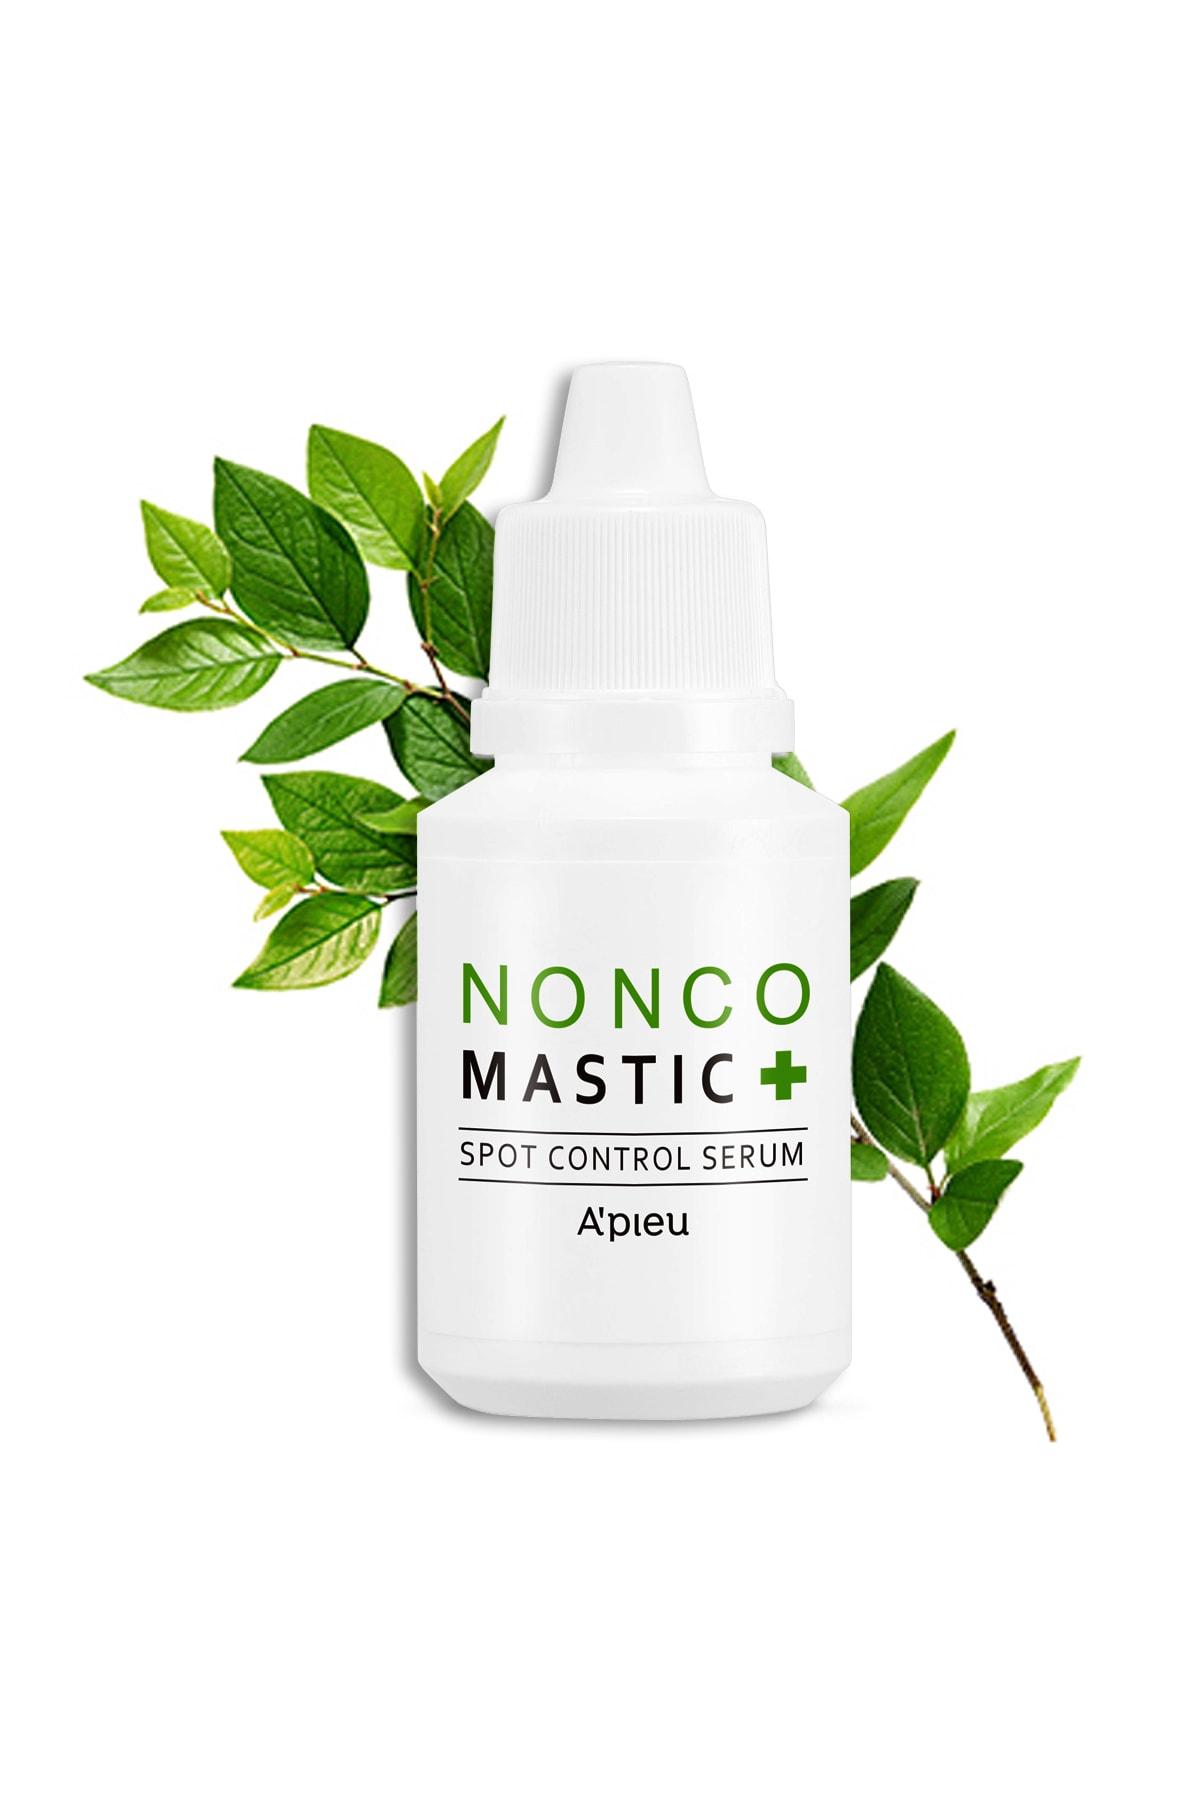 Missha Sivilceli Hassas Ciltler İçin Sakız Özlü Serum 30ml APIEU Nonco Mastic Spot Control Serum